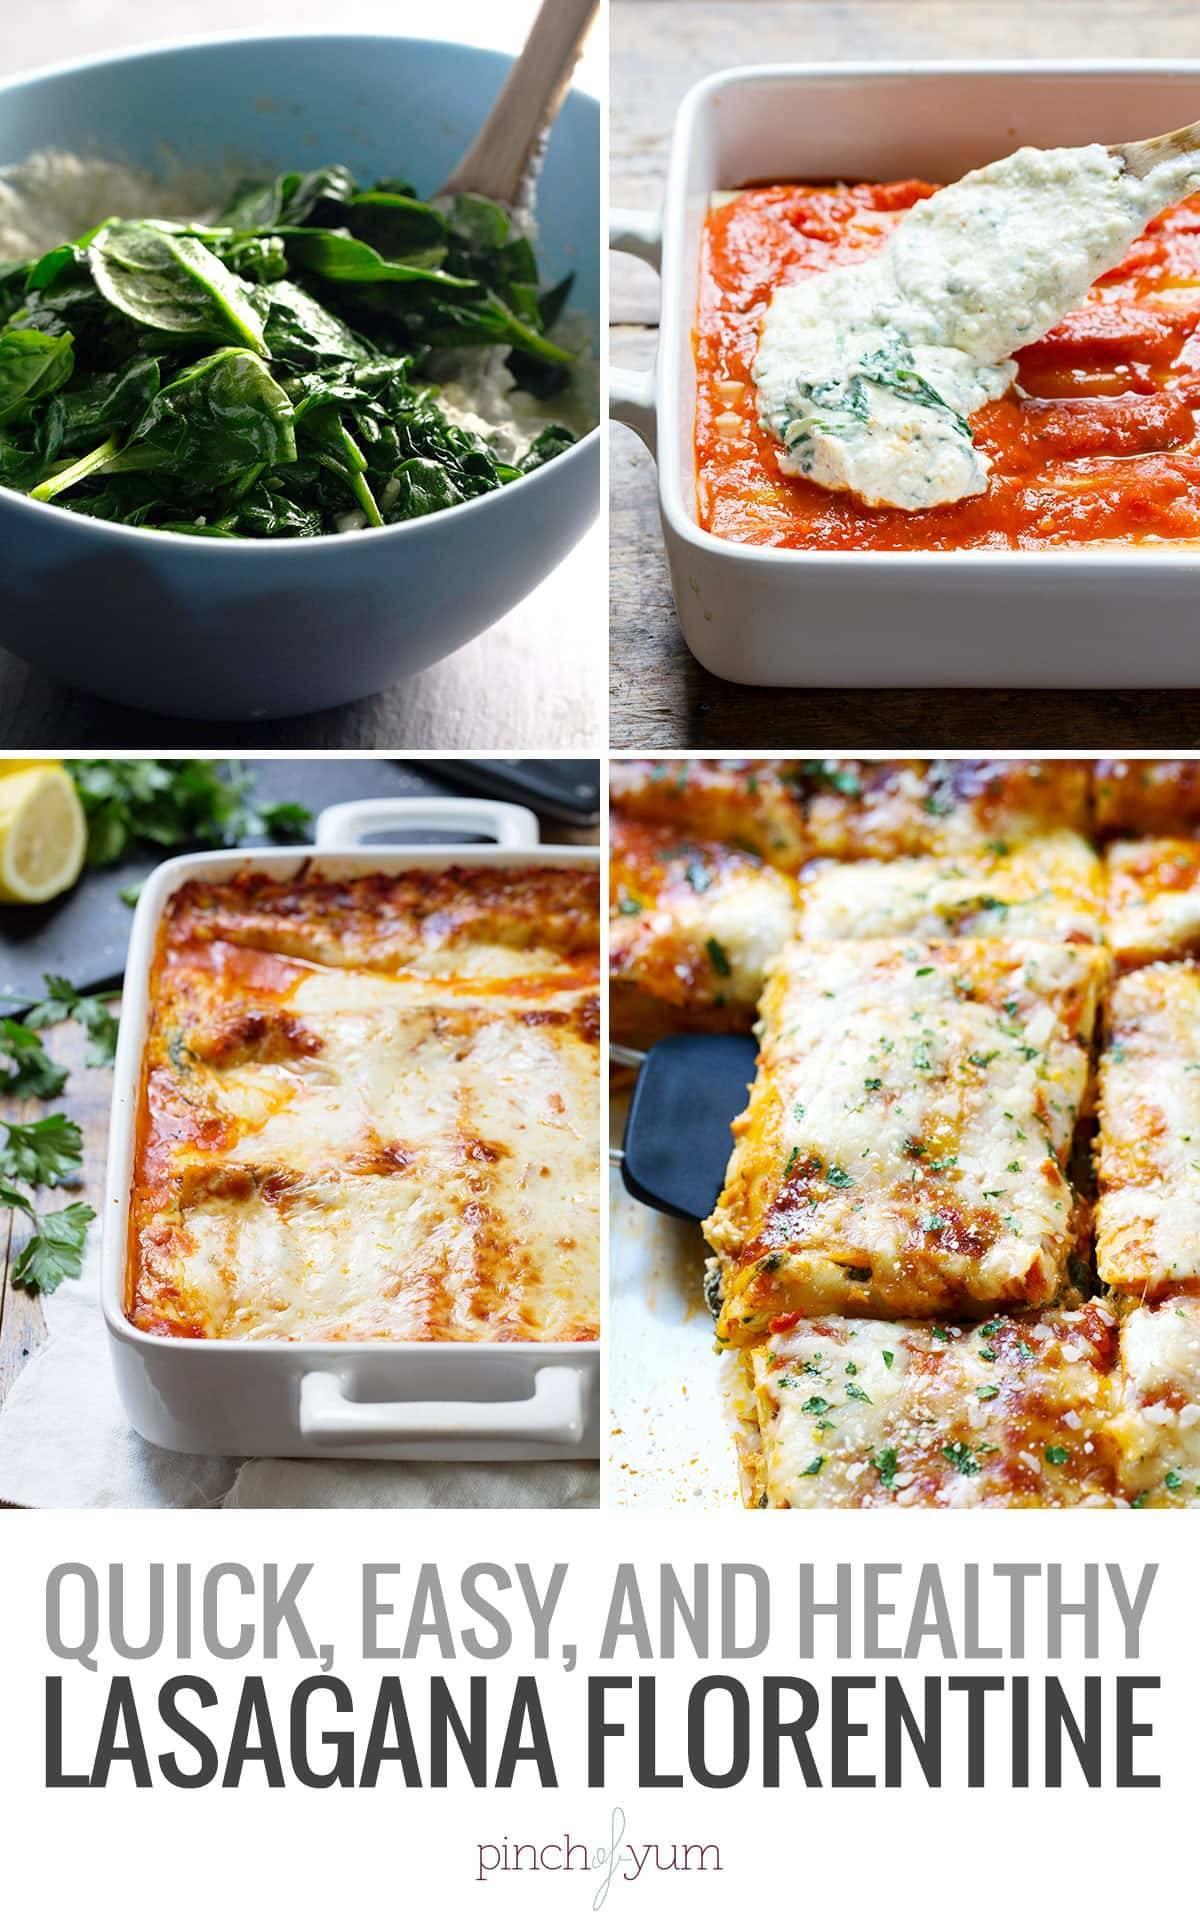 Tomato Lasagna Florentine making process.